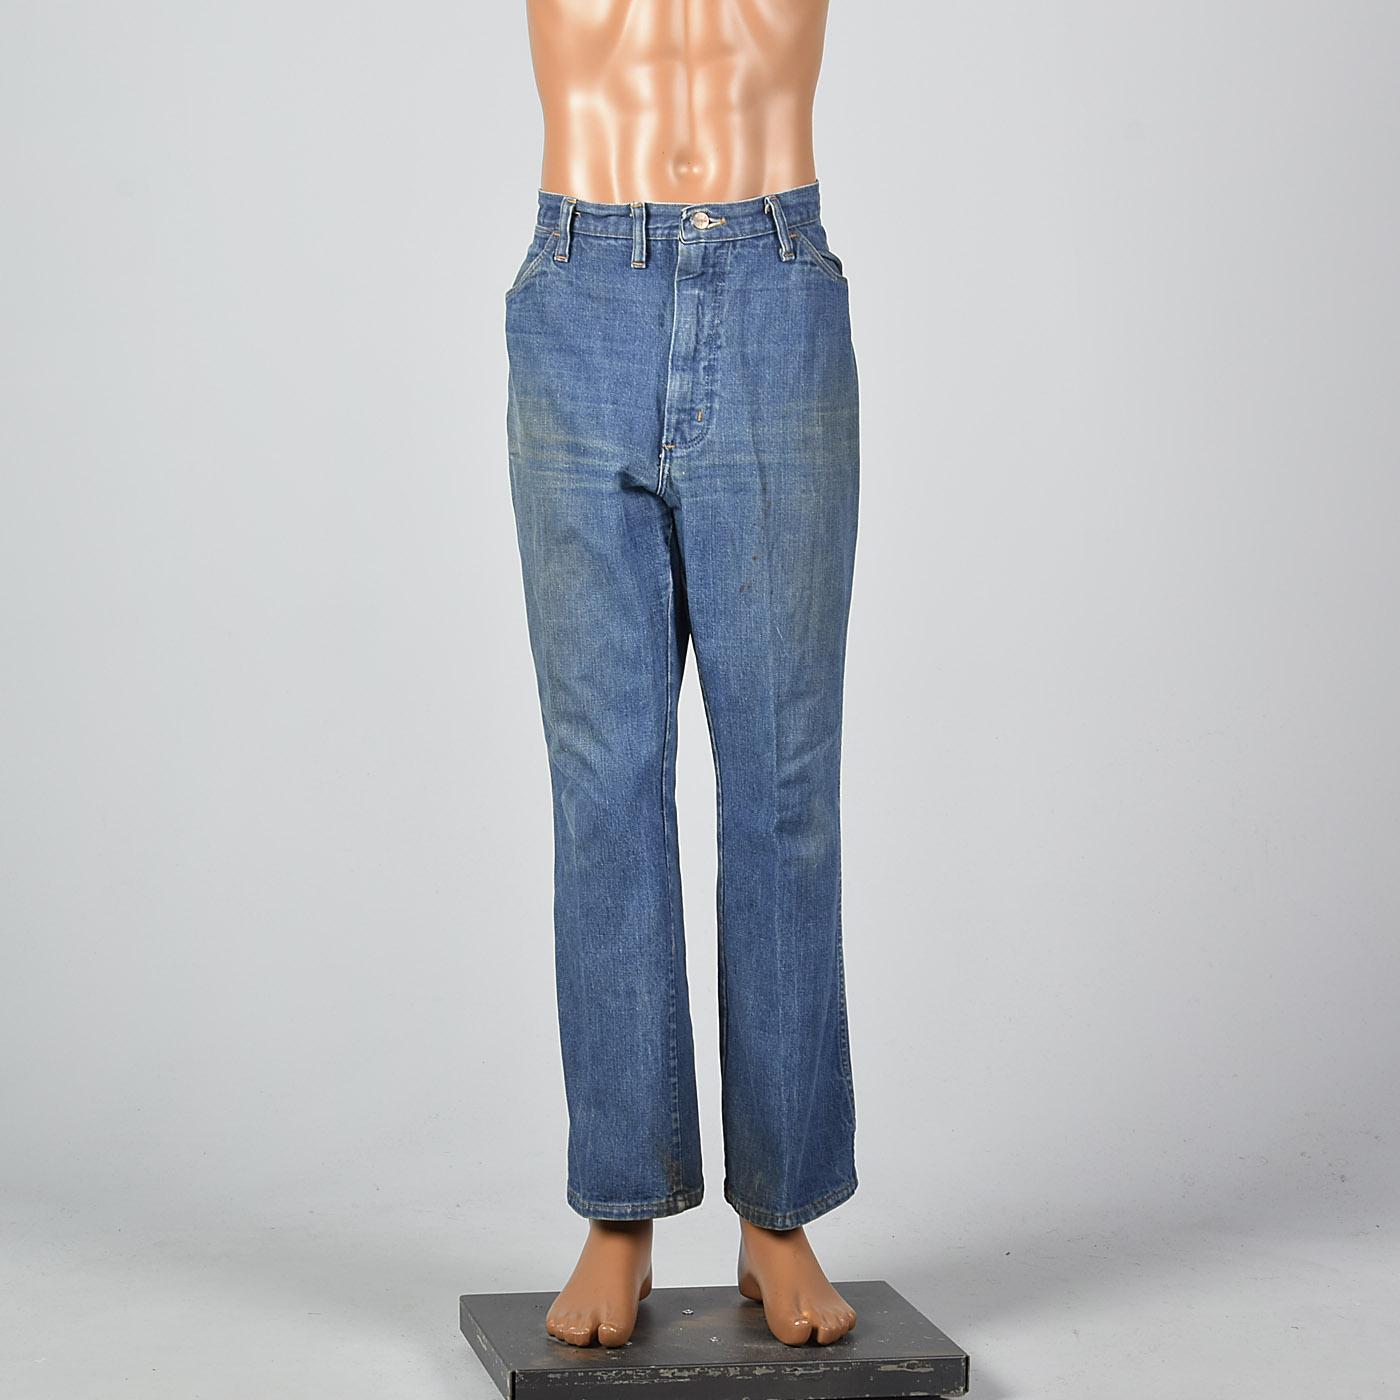 70s Wrangler Rapid Transit Jeans 30 Inseam 32 Waist